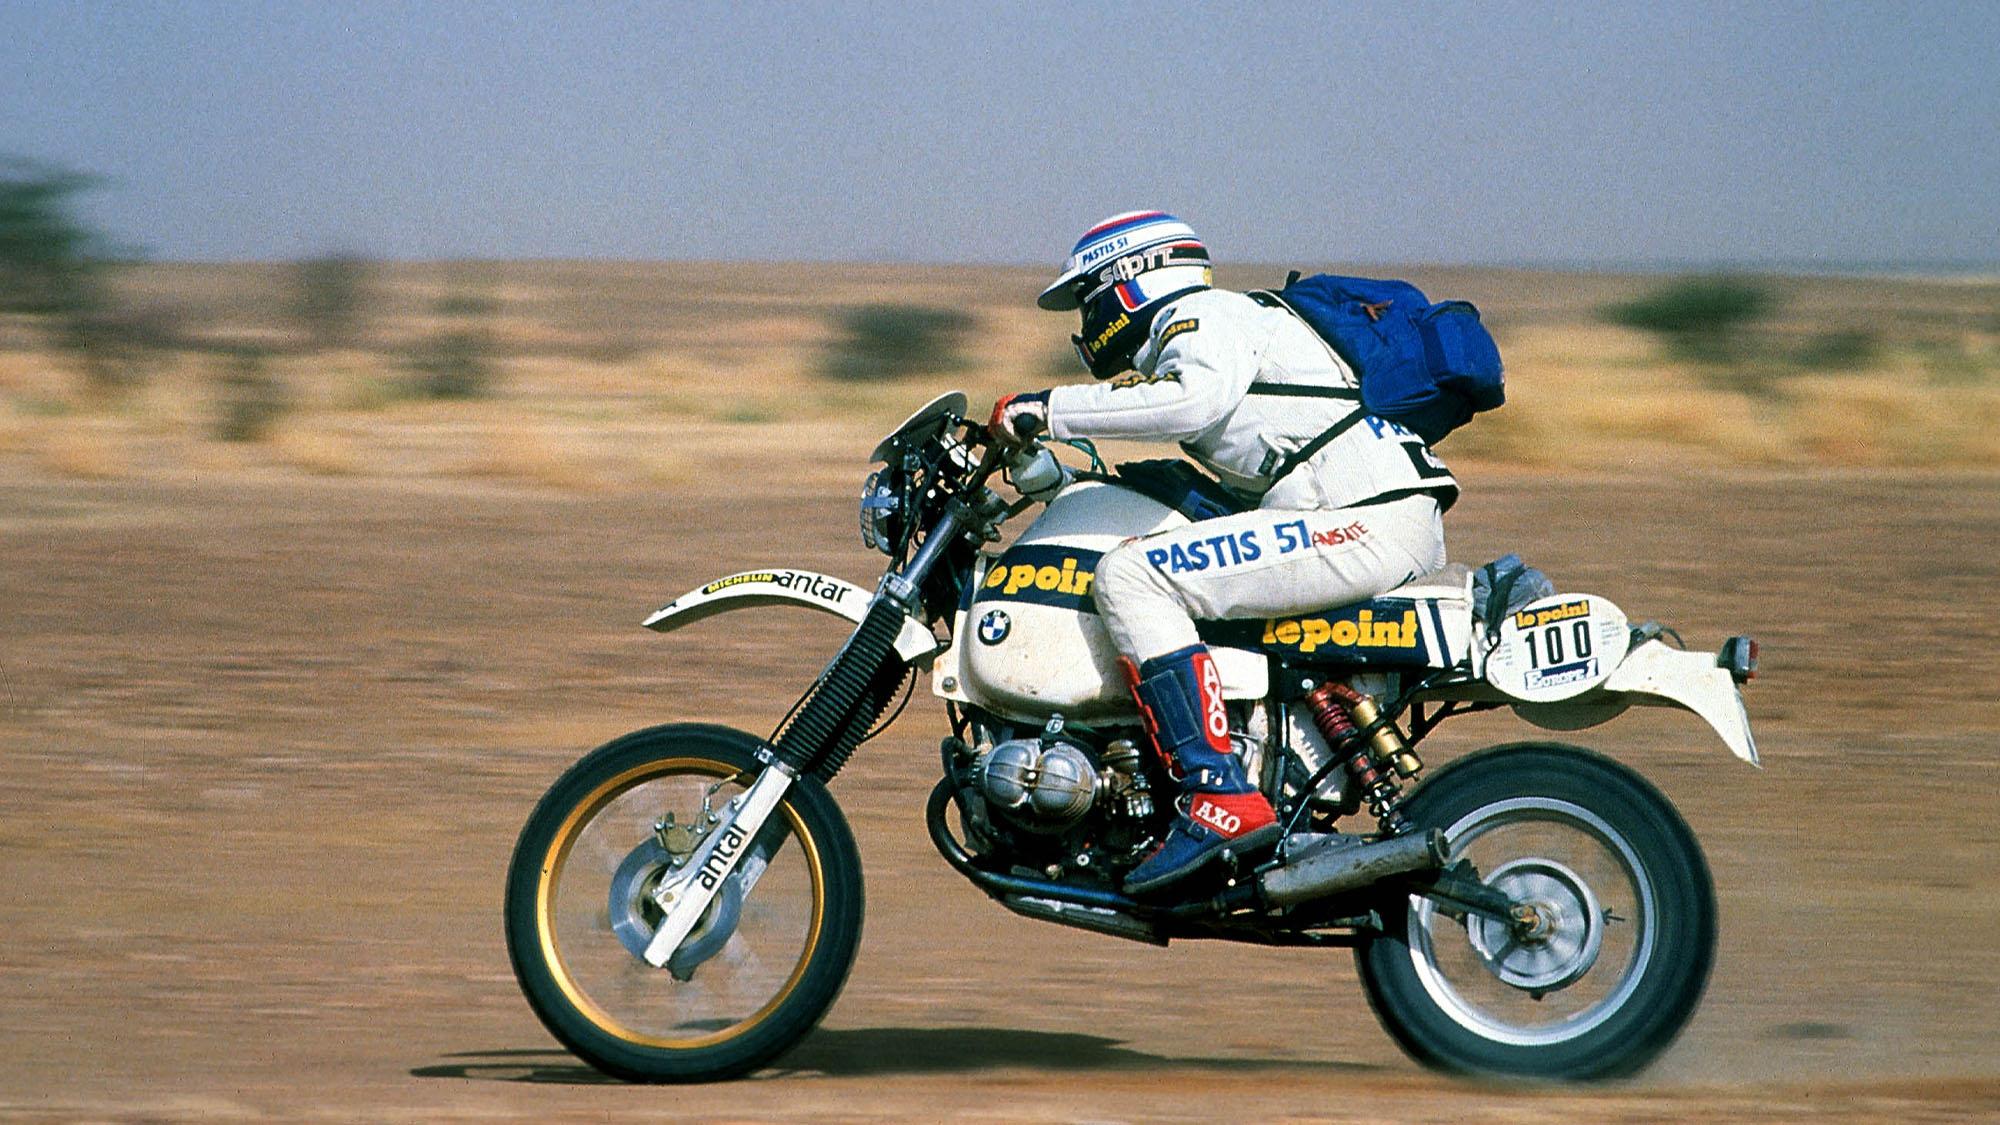 AUTO - OFF ROAD RALLY 1983 - PARIS ALGER DAKAR - N ° 100 - HUBERT AURIOL (FRA) / BMW - WINNER - ACTION- PHOTO: DPPI